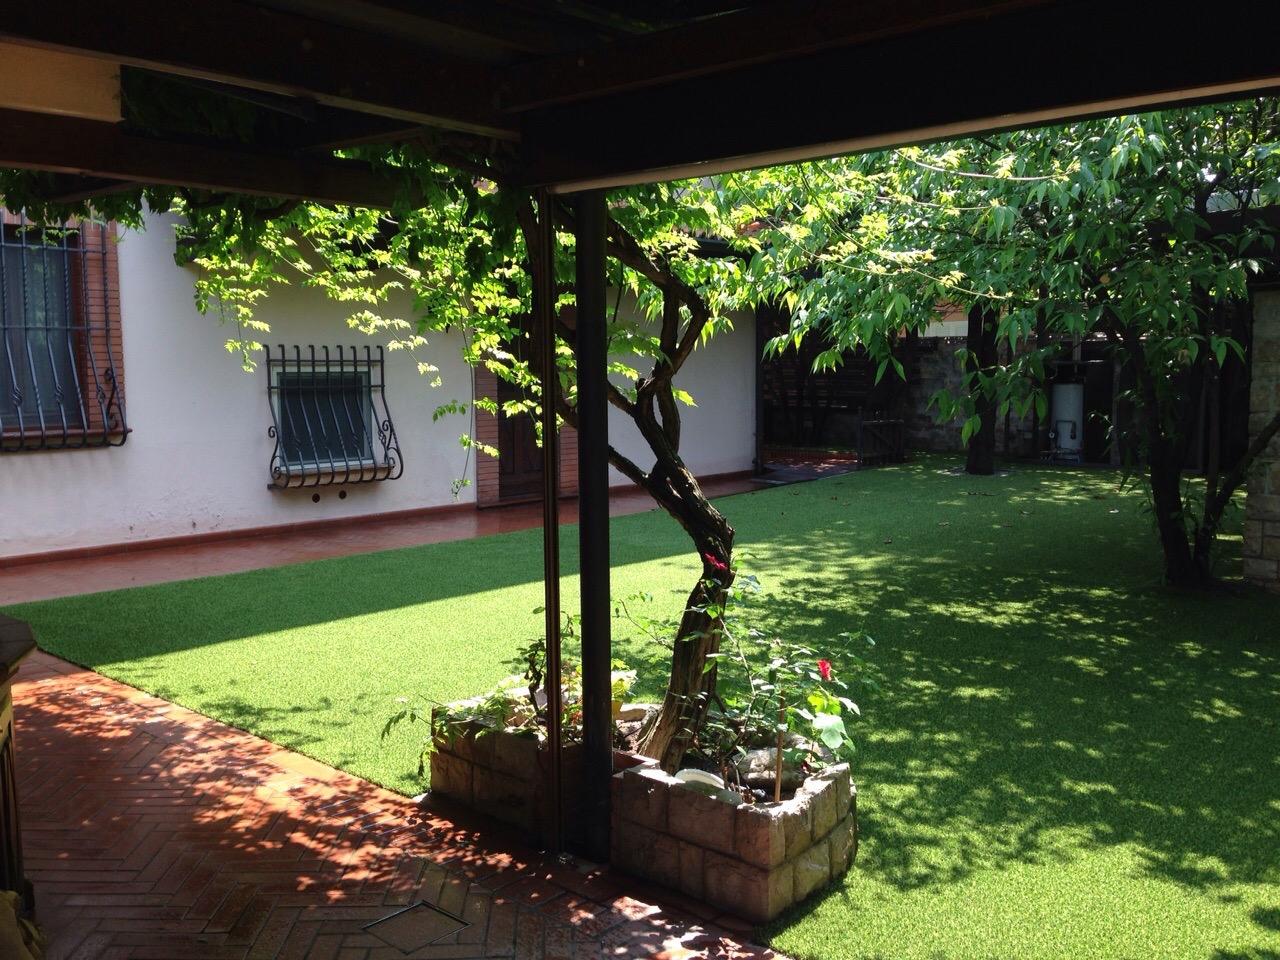 Ikea arredo giardino con soluzioni giardino senza erba for Erba a rotoli leroy merlin